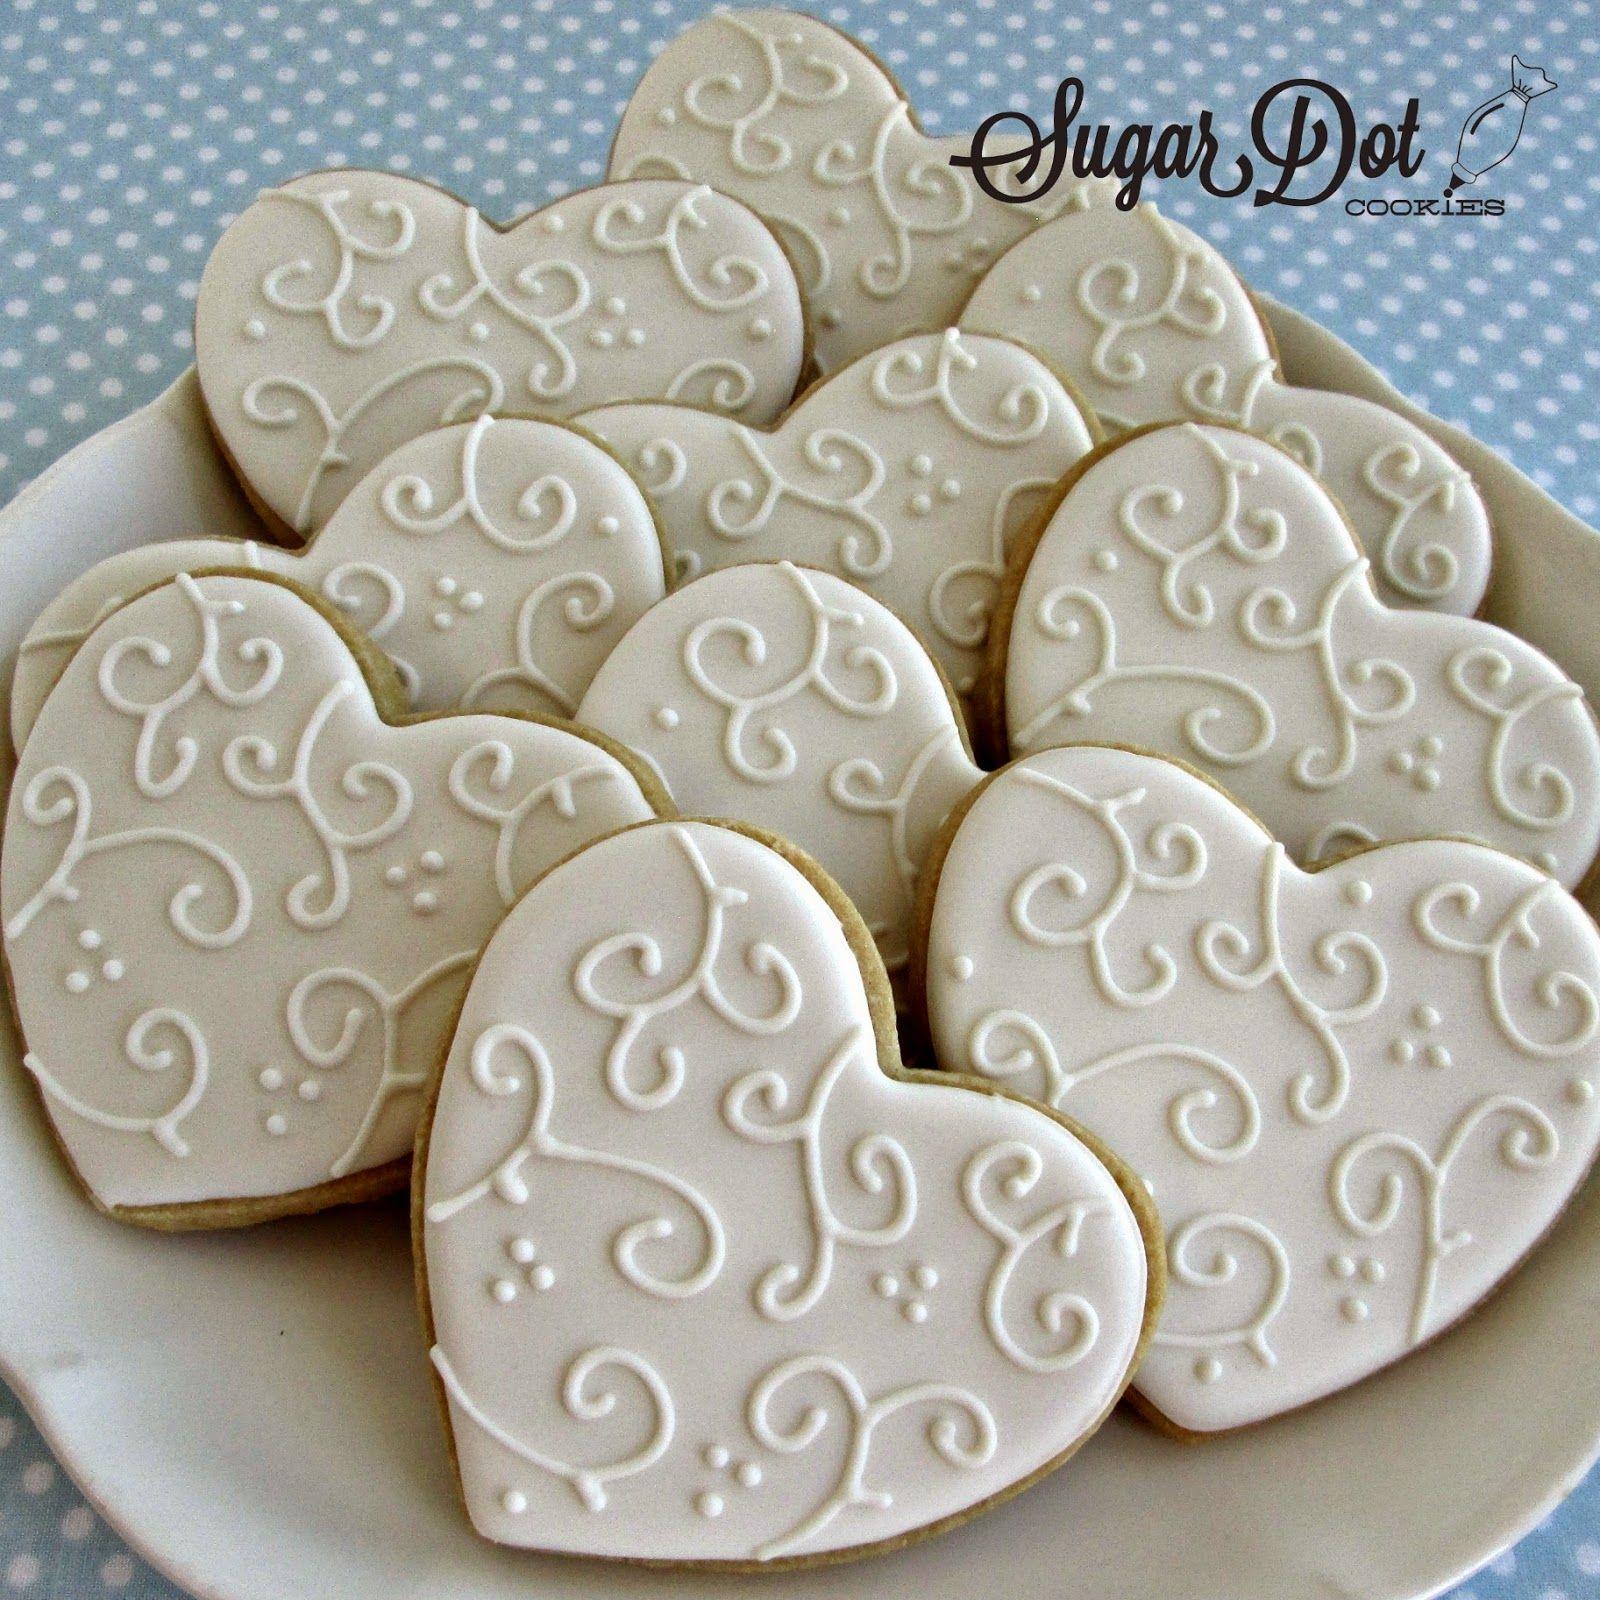 Sugar Dot Cookies White on White Heart Sugar Cookies